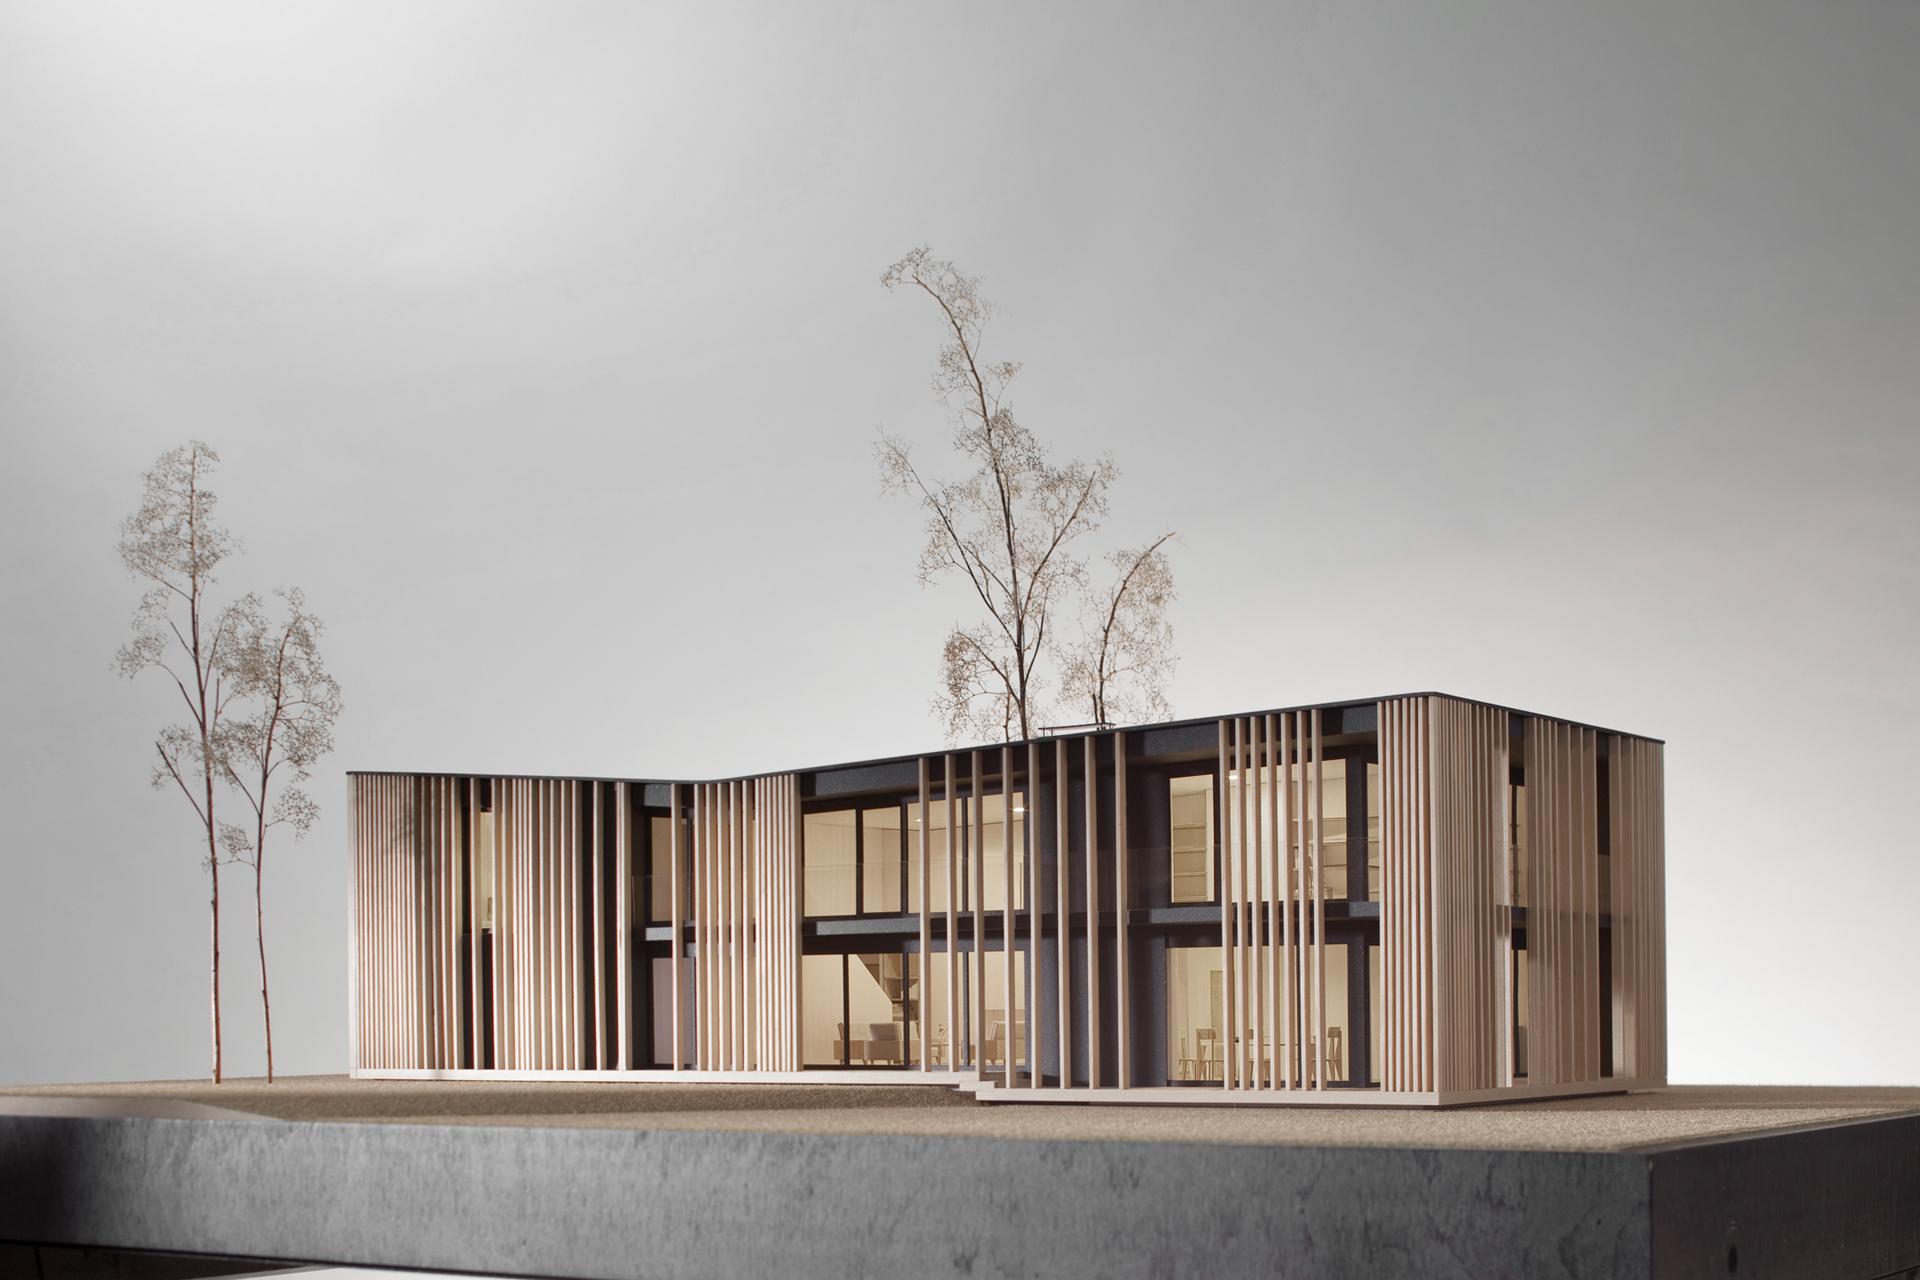 onimo-makiety-architektoniczne-PAG-shutter-03